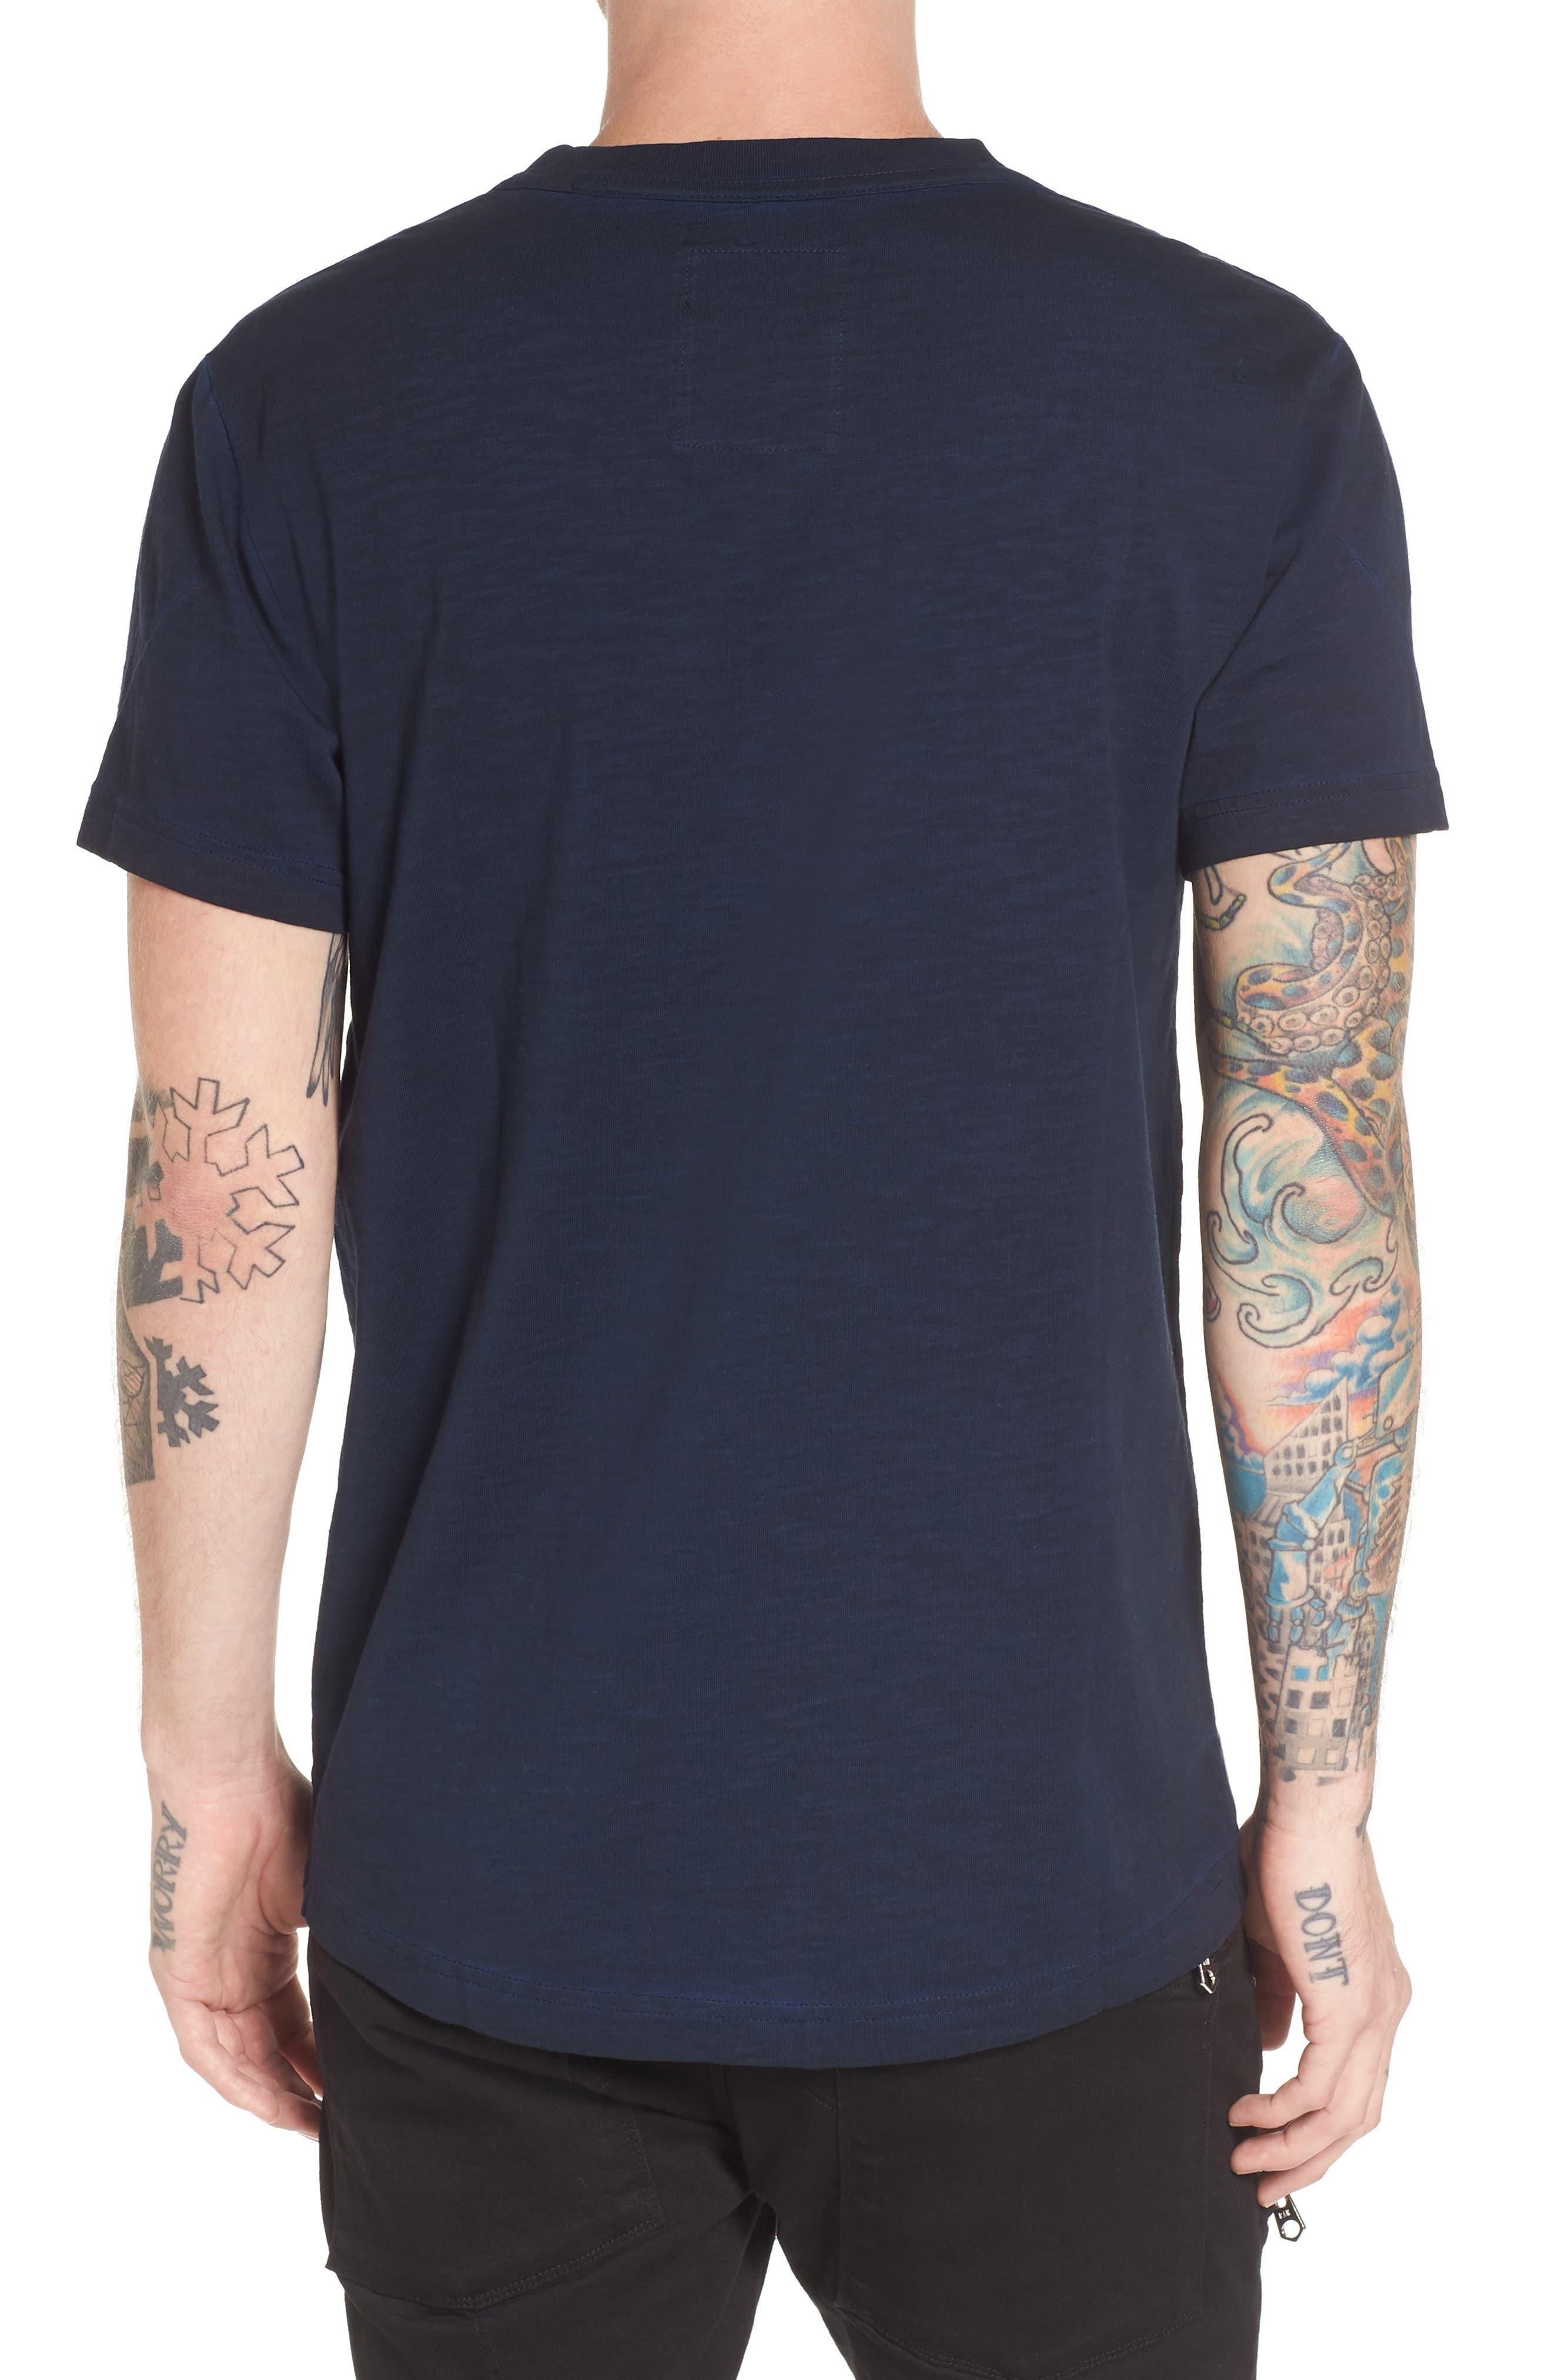 Stalt Pocket T-Shirt,                             Alternate thumbnail 2, color,                             400